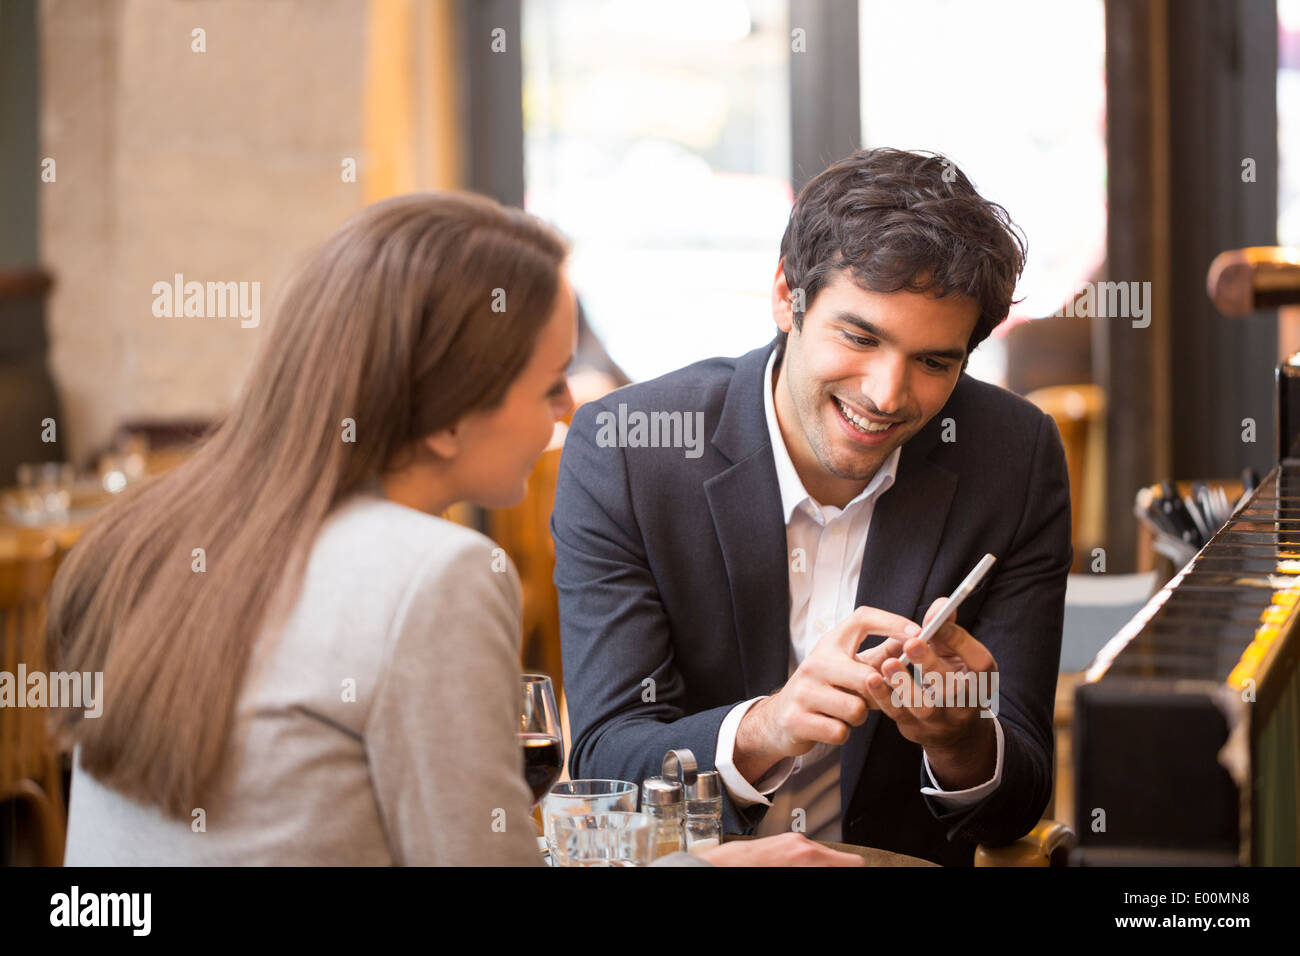 Man woman using cell phone coffee bar - Stock Image